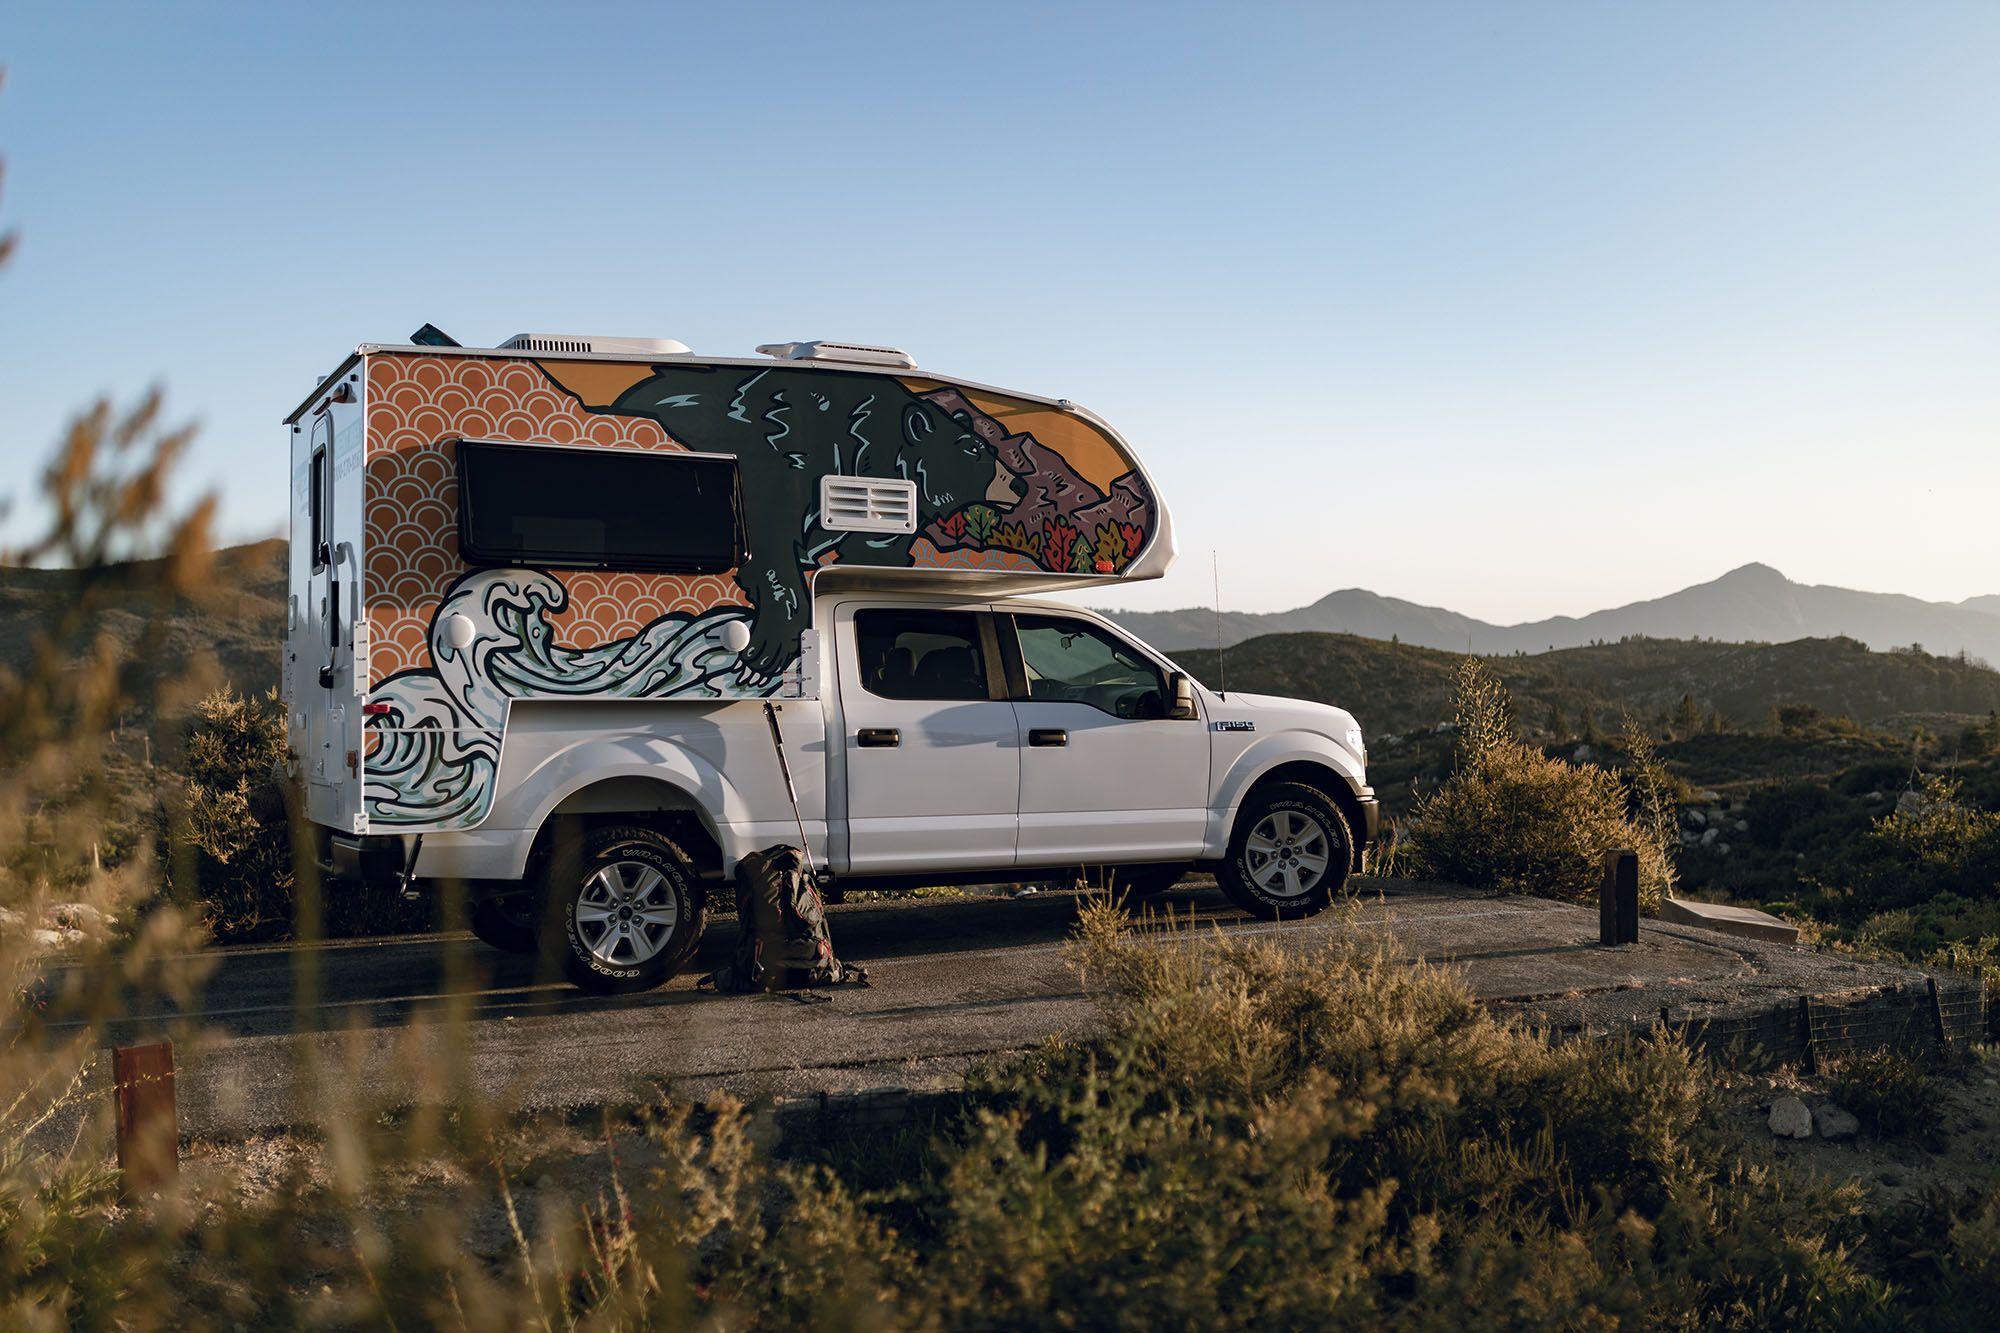 Newport Camper 3 Berth Truck Camper Rentals Truck Camper